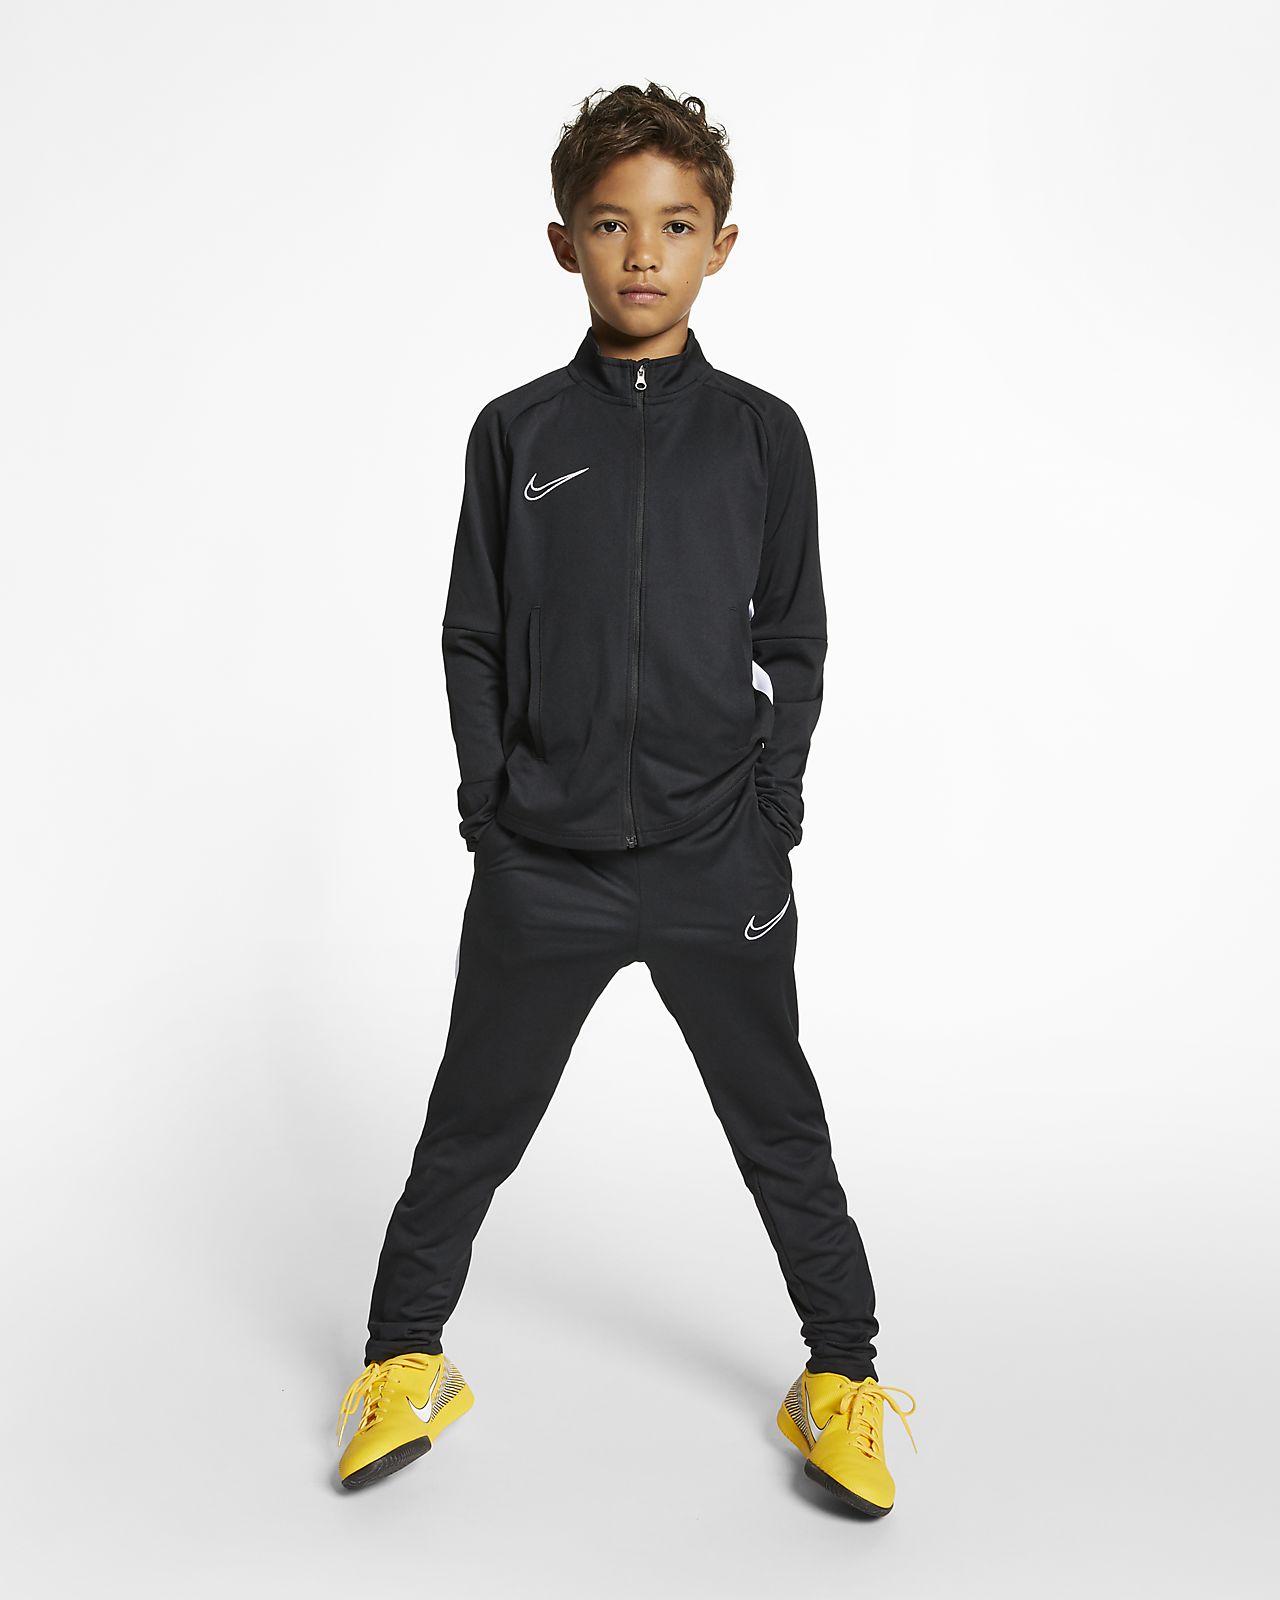 a2335f61918571 Tuta da calcio Nike Dri-FIT Academy - Ragazzi. Nike.com CH